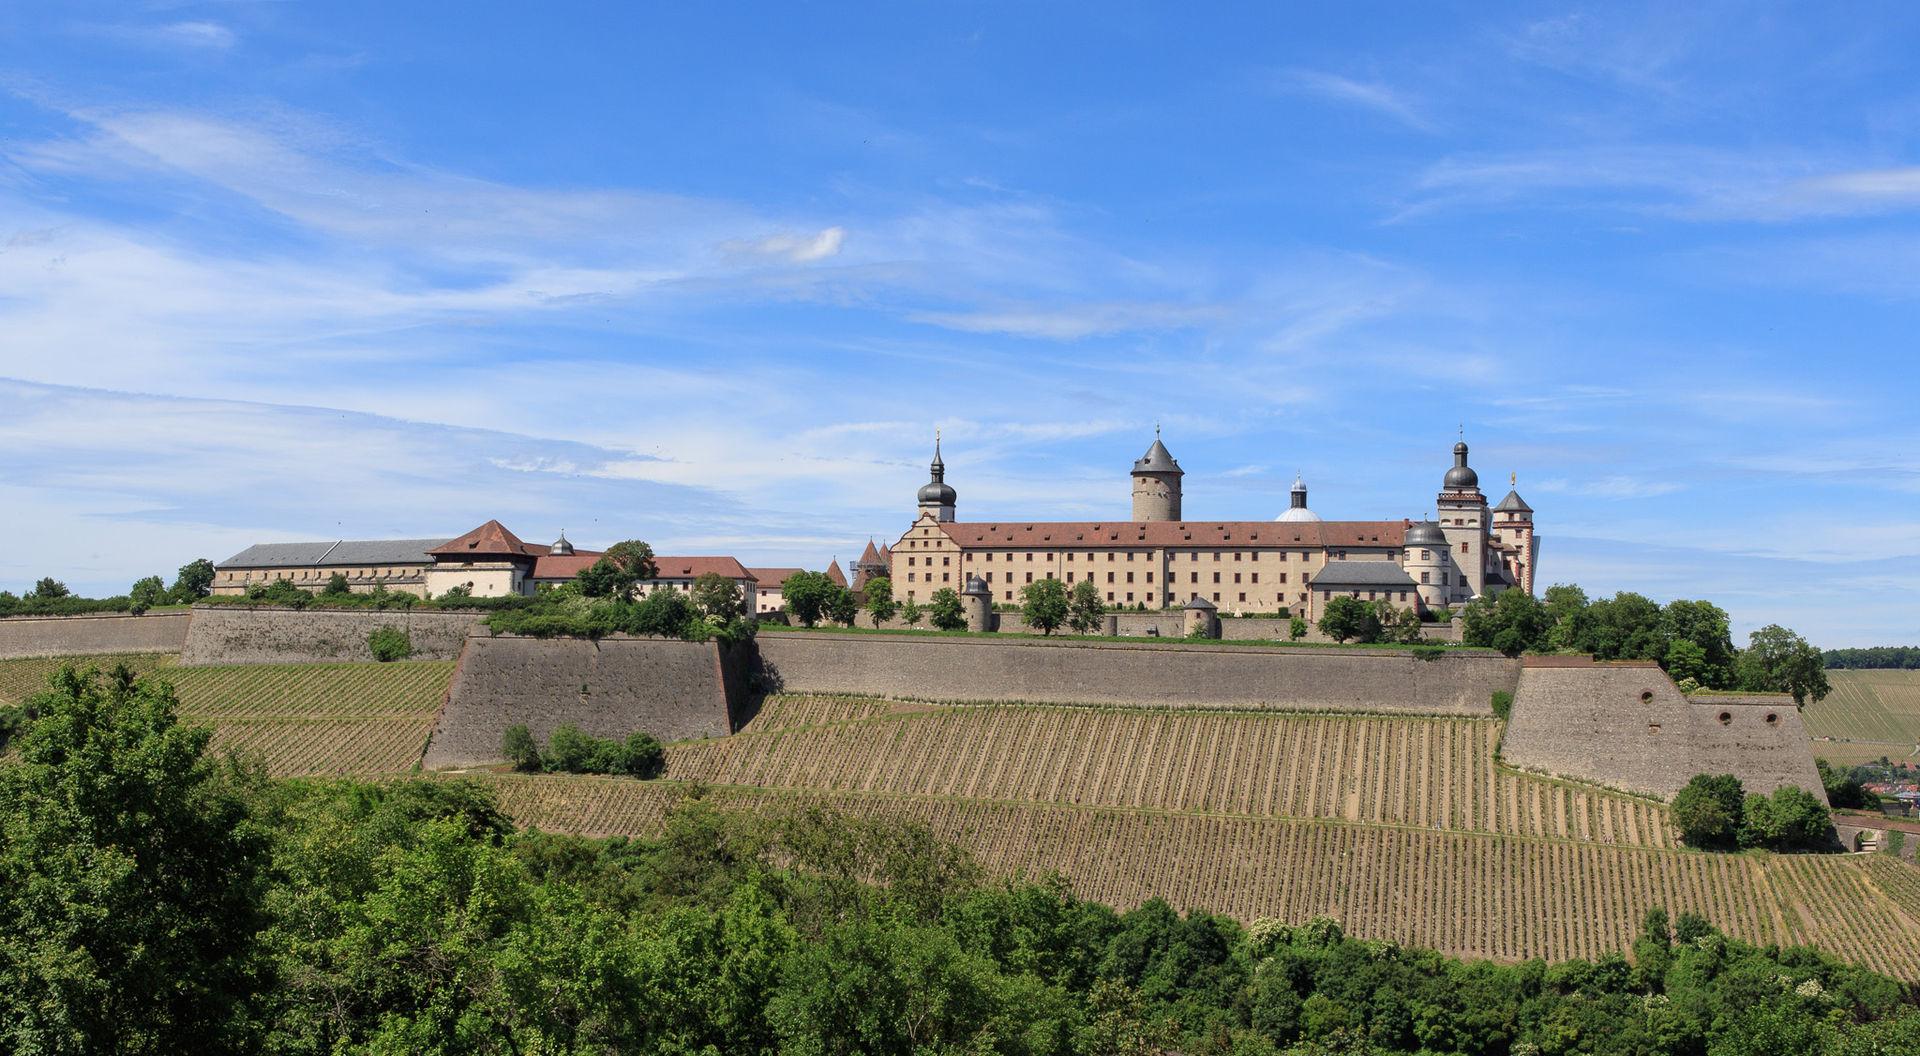 Bild Festung Marienberg Würzburg